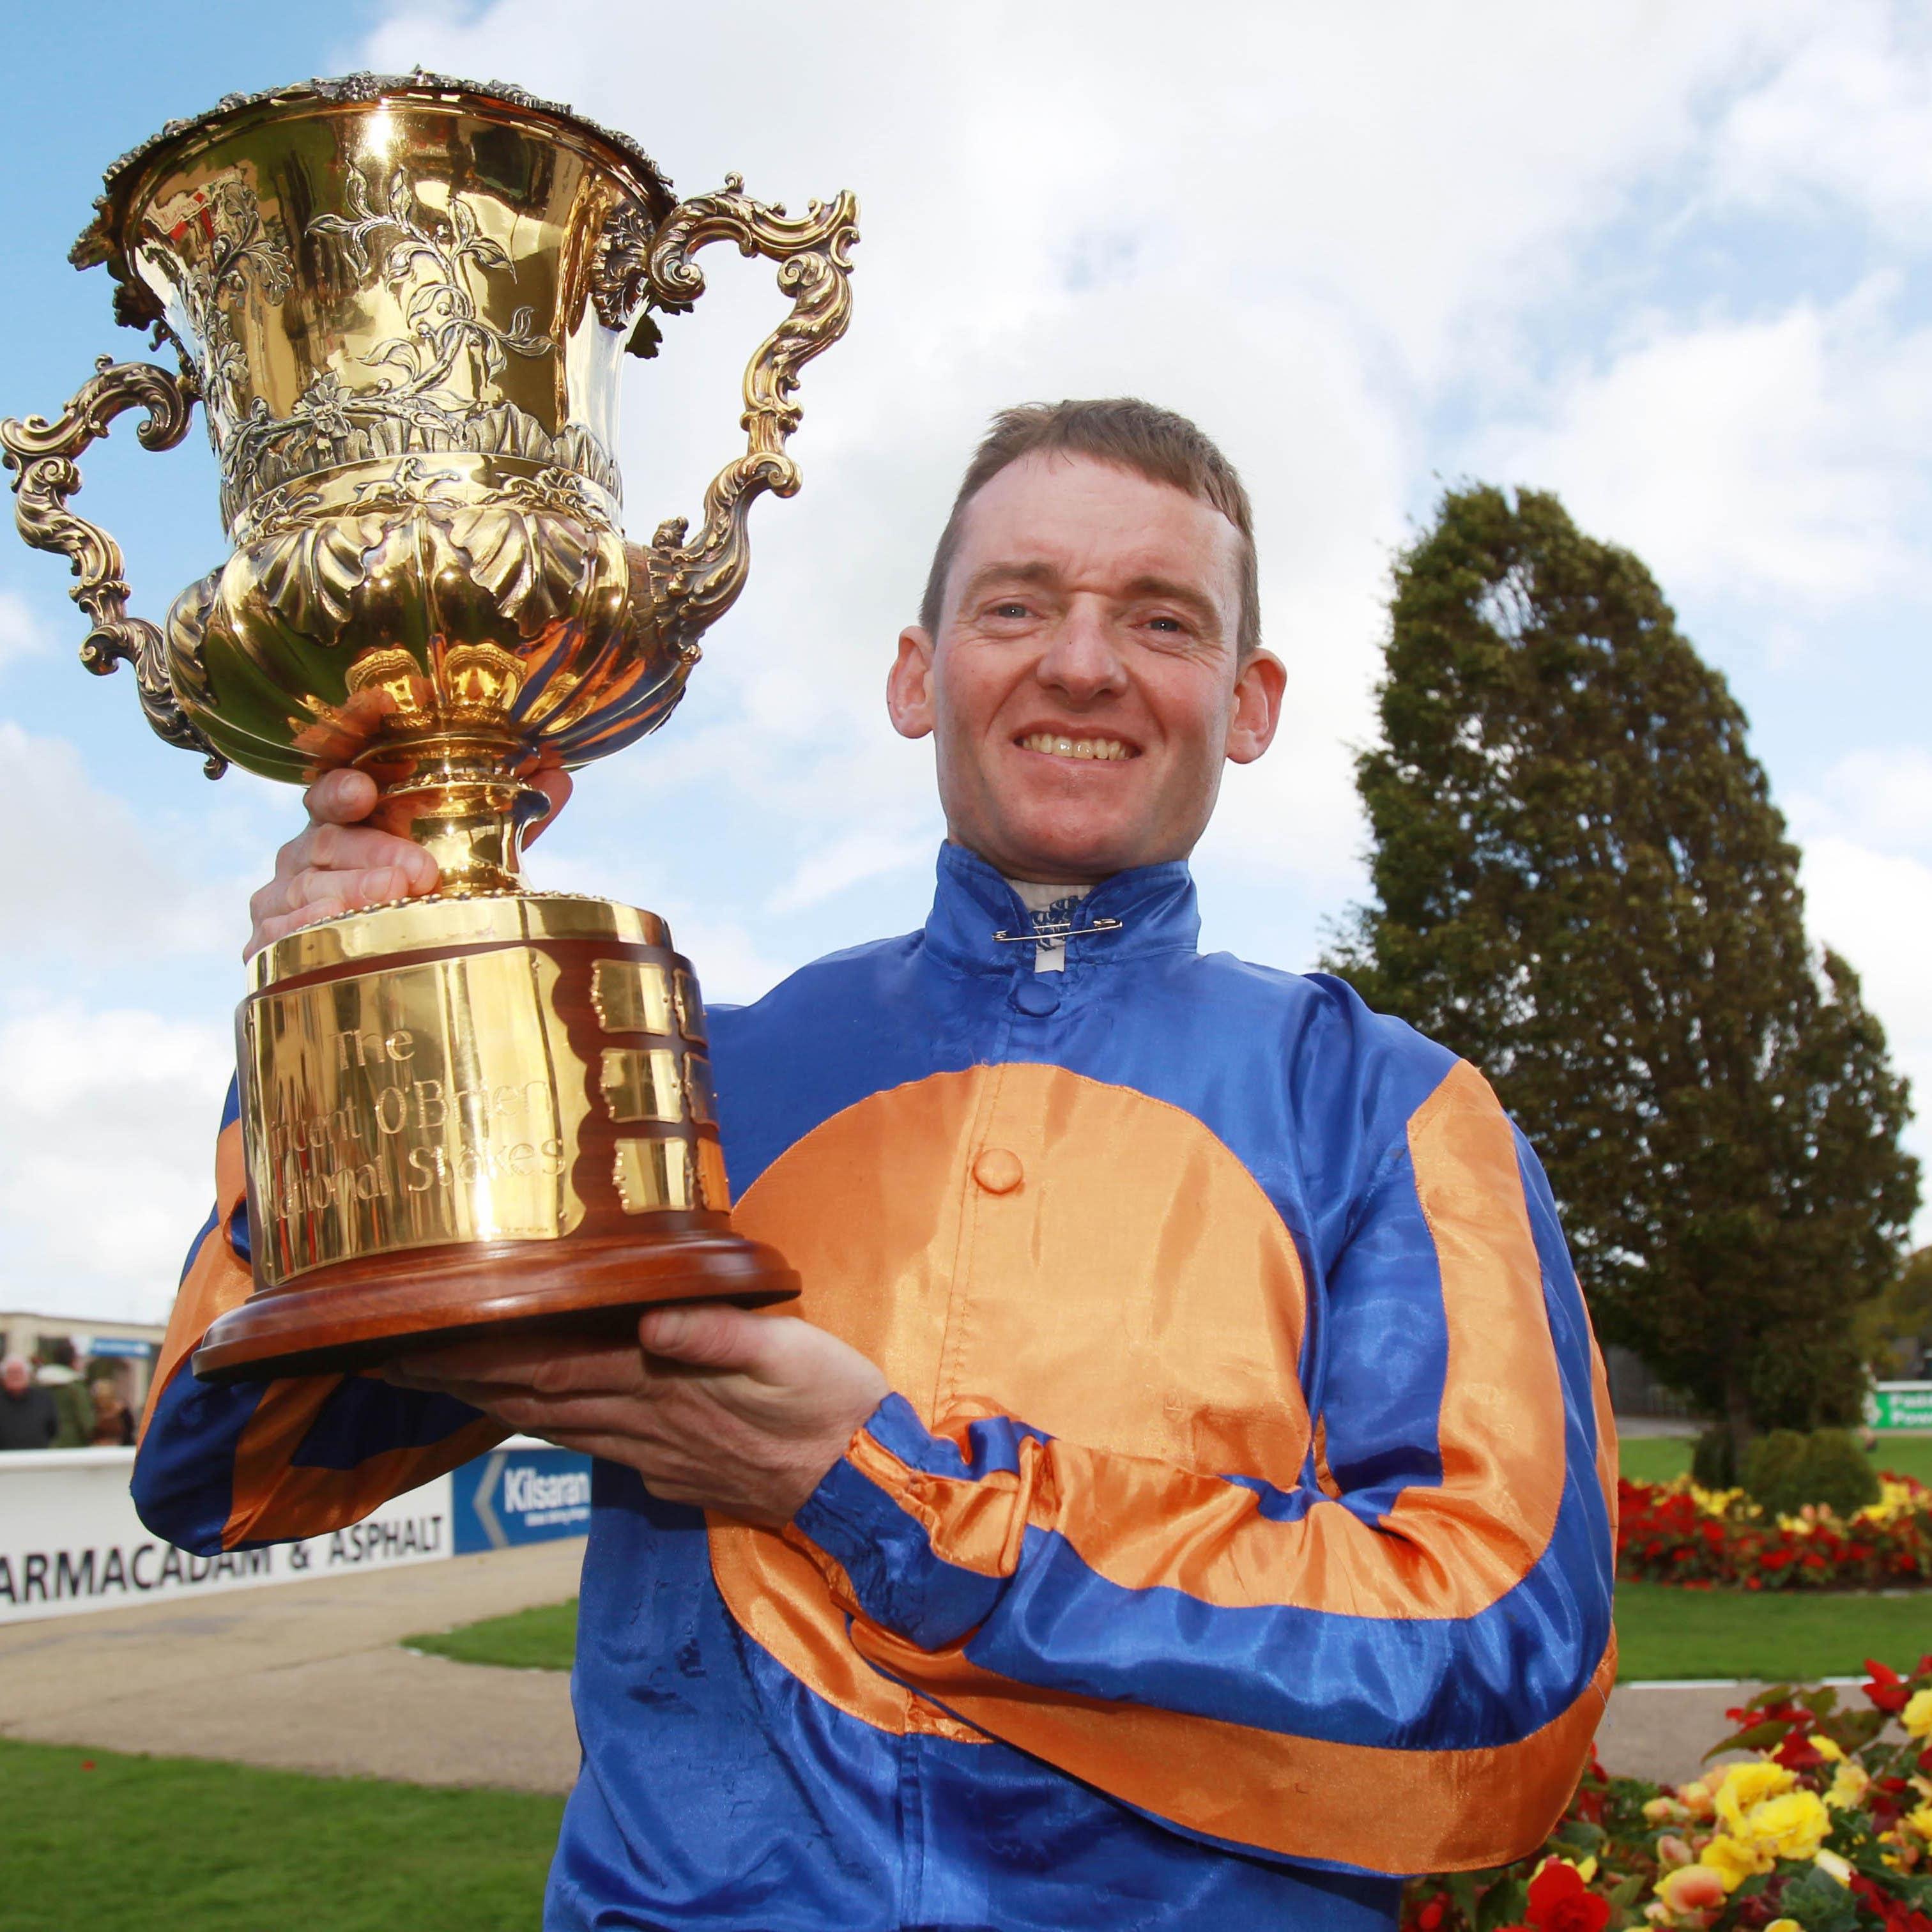 Seamus Heffernan rode Etoile to victory